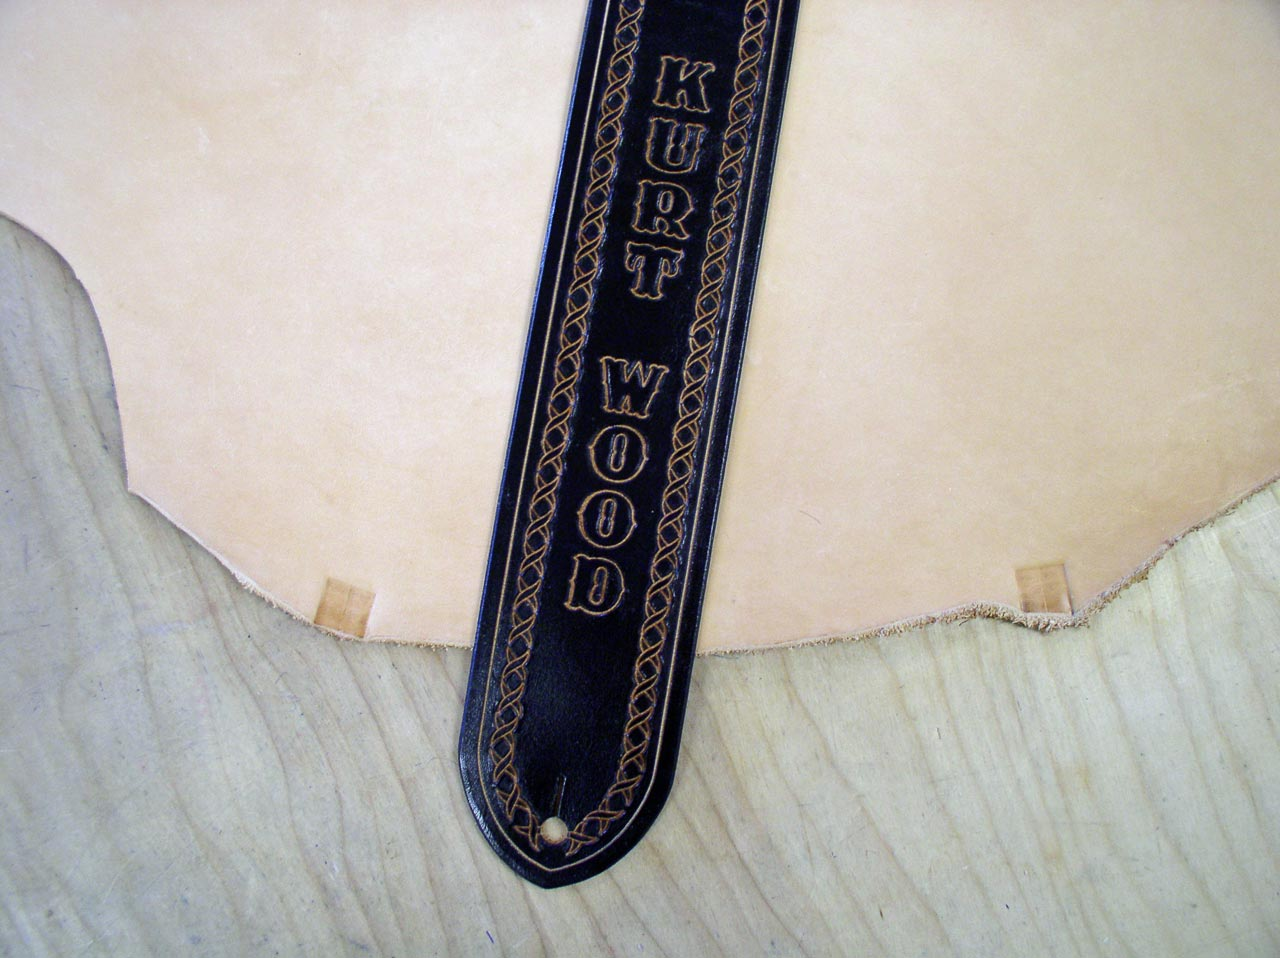 Finished custom guitar strap